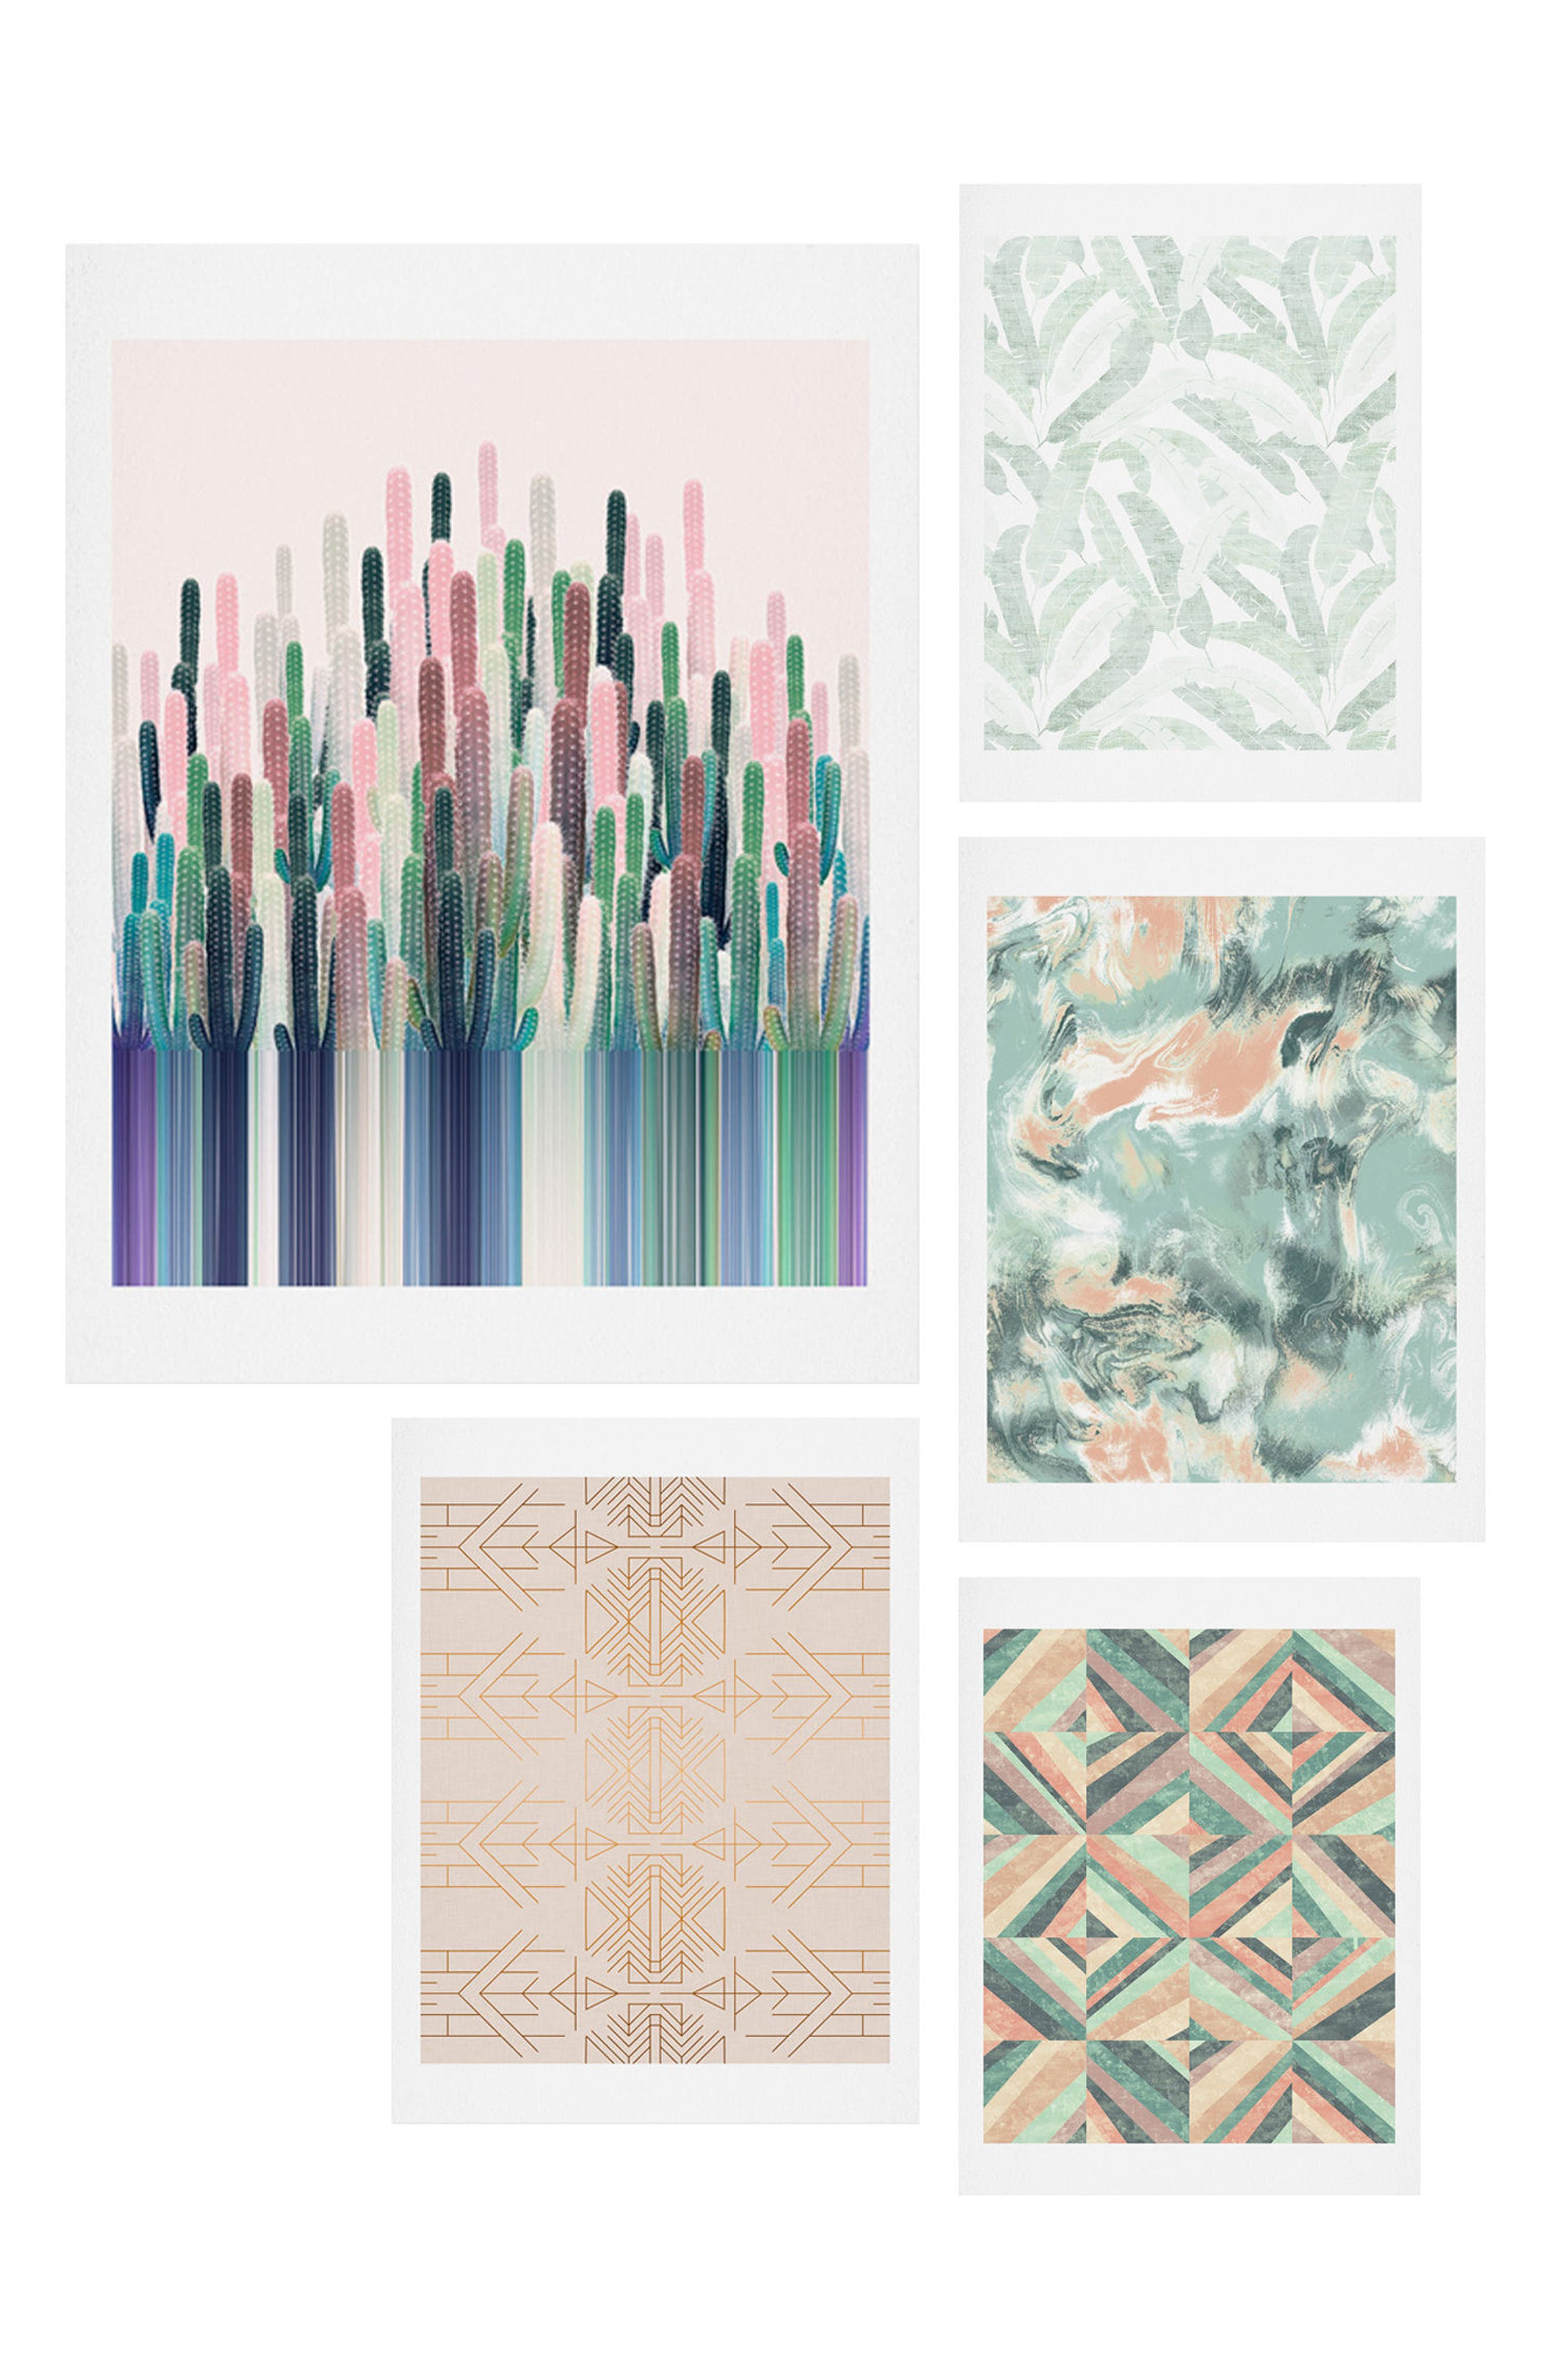 Deny Designs Matcha Blush Five-Piece Gallery Wall Art Print Set